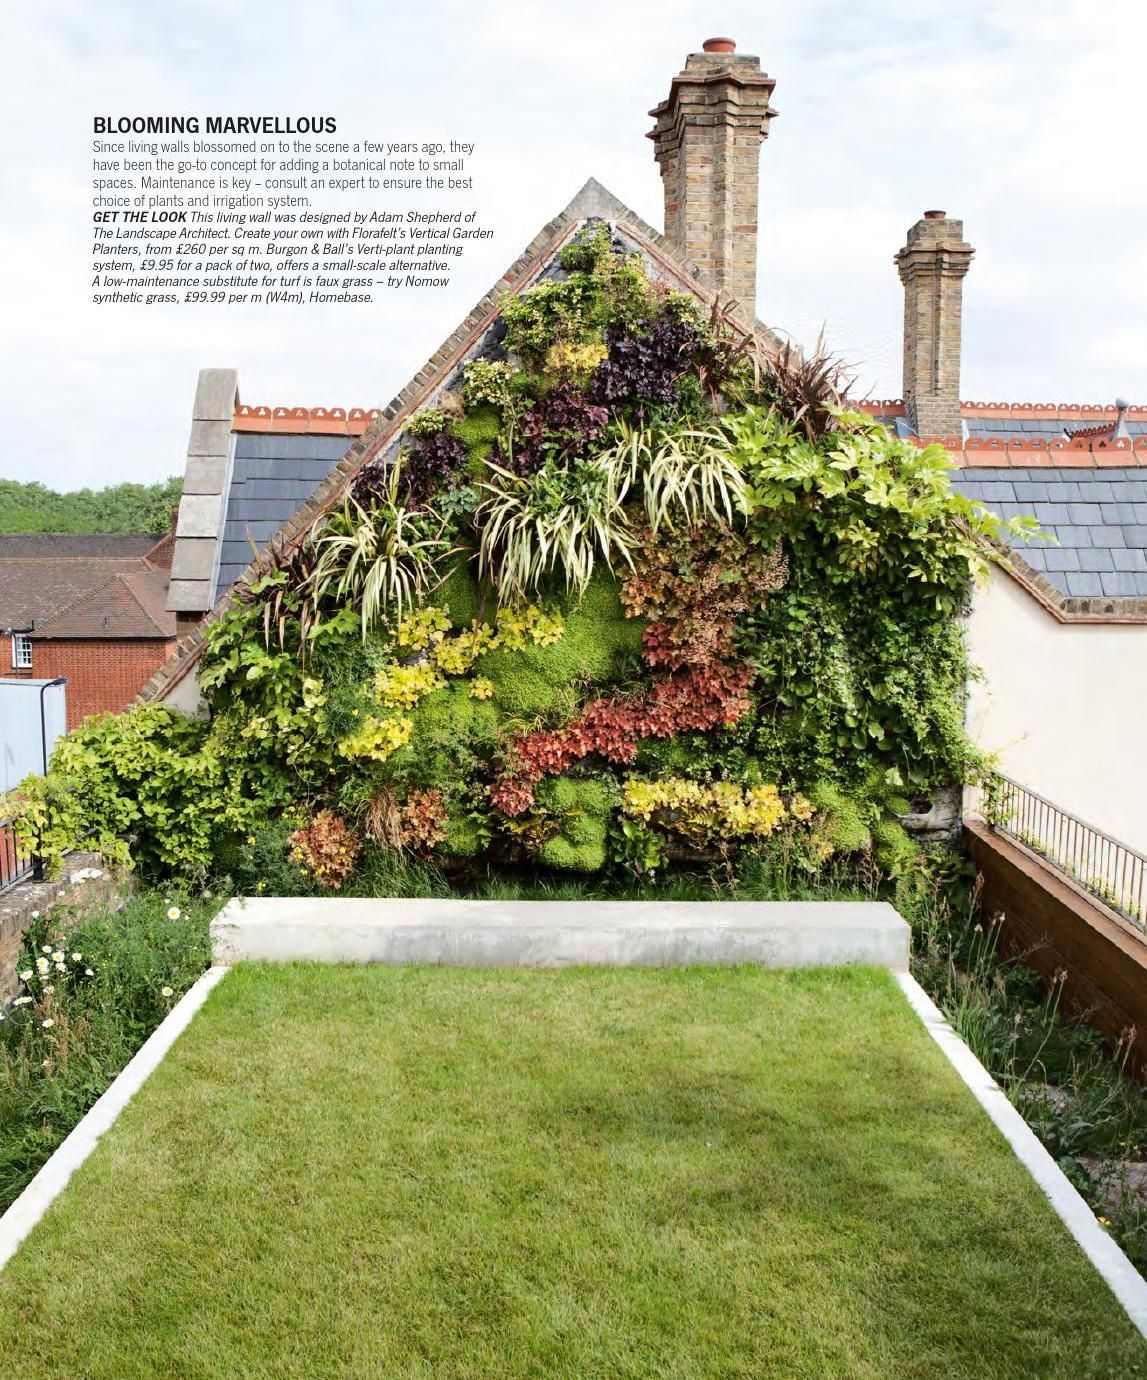 Roof Top Garden Terrace Garden Kitchen Garden Vegetable: How To Feng Shui Your Home For Better Balance